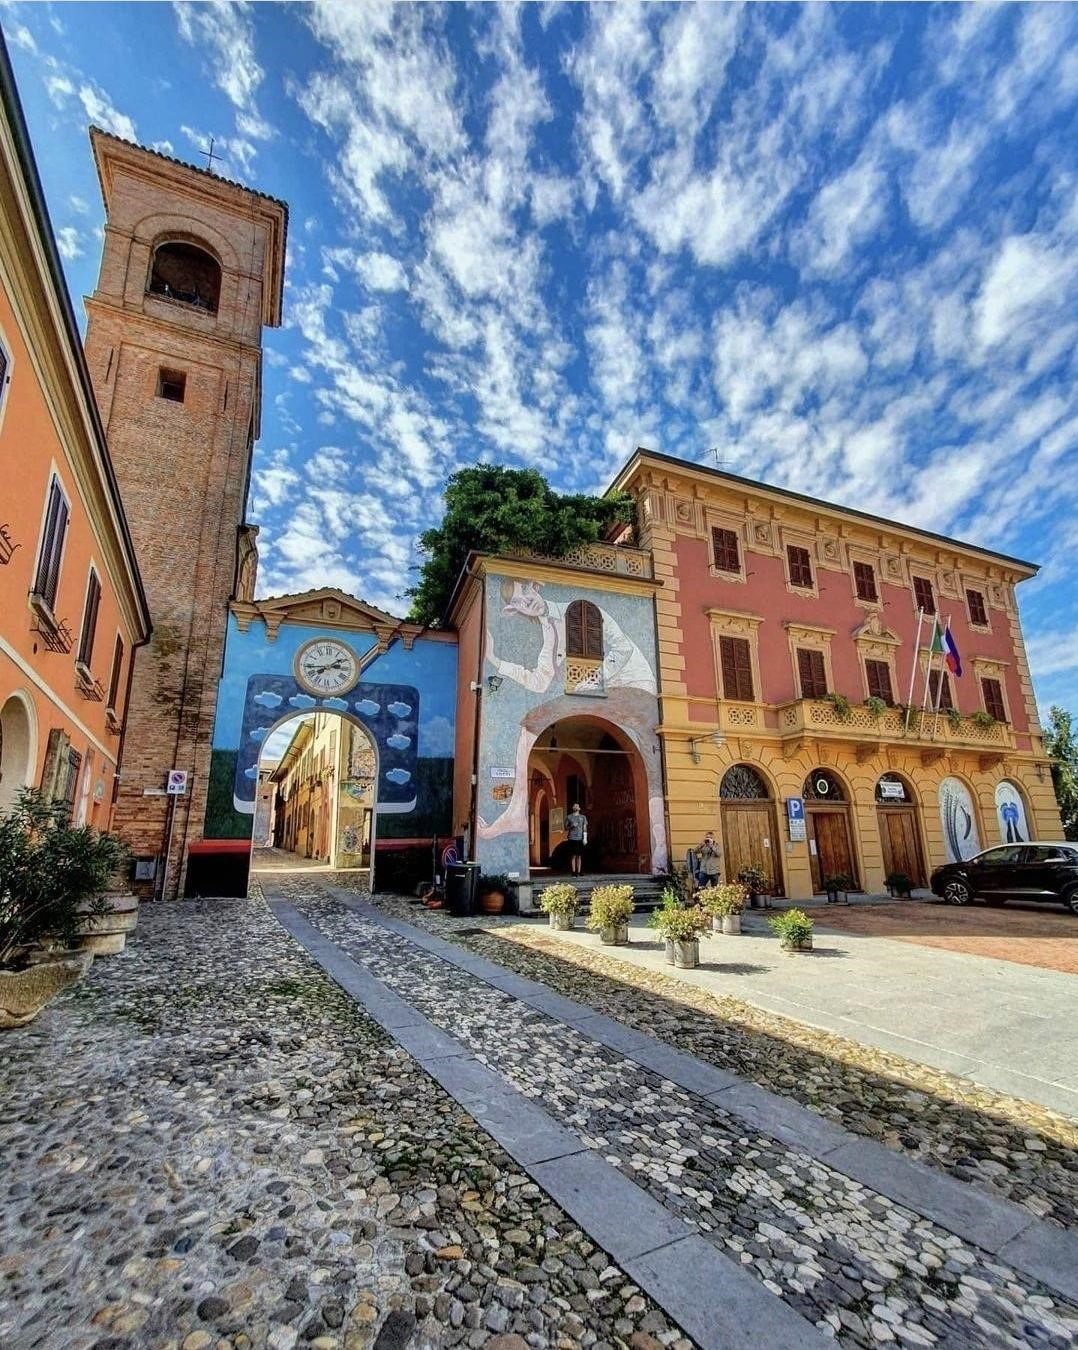 Dozza Emilia Romagna mooiste dorpjes van Italië